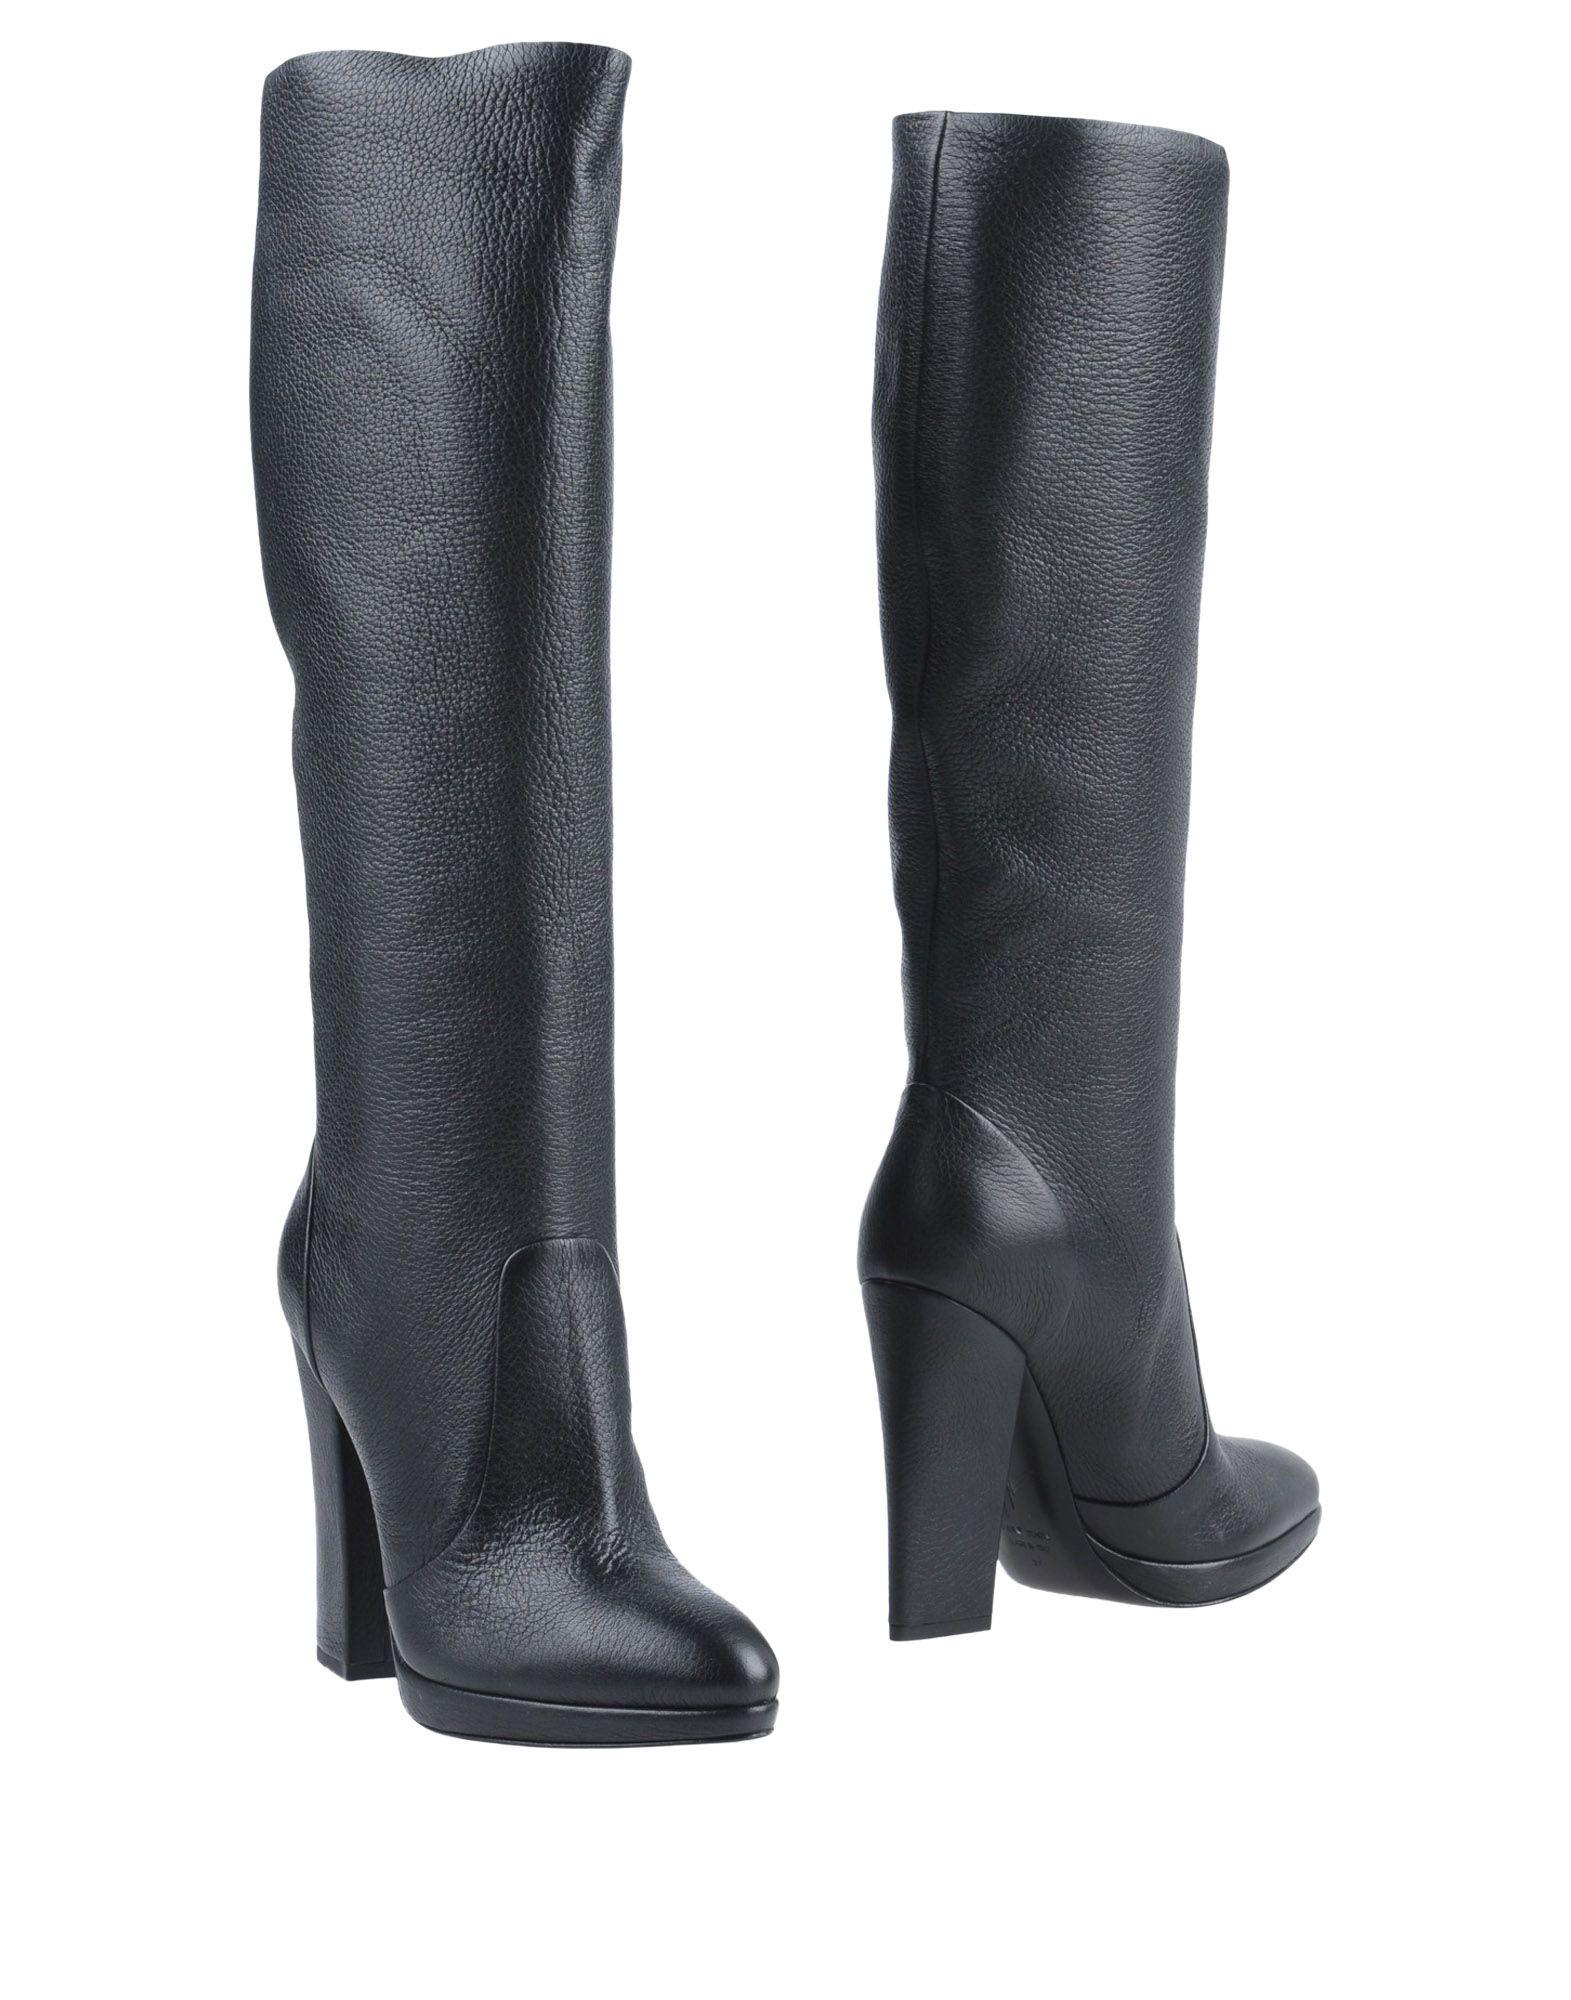 Giuseppe Giuseppe Giuseppe Zanotti Stiefel Damen  11318054CJ Beliebte Schuhe c93734